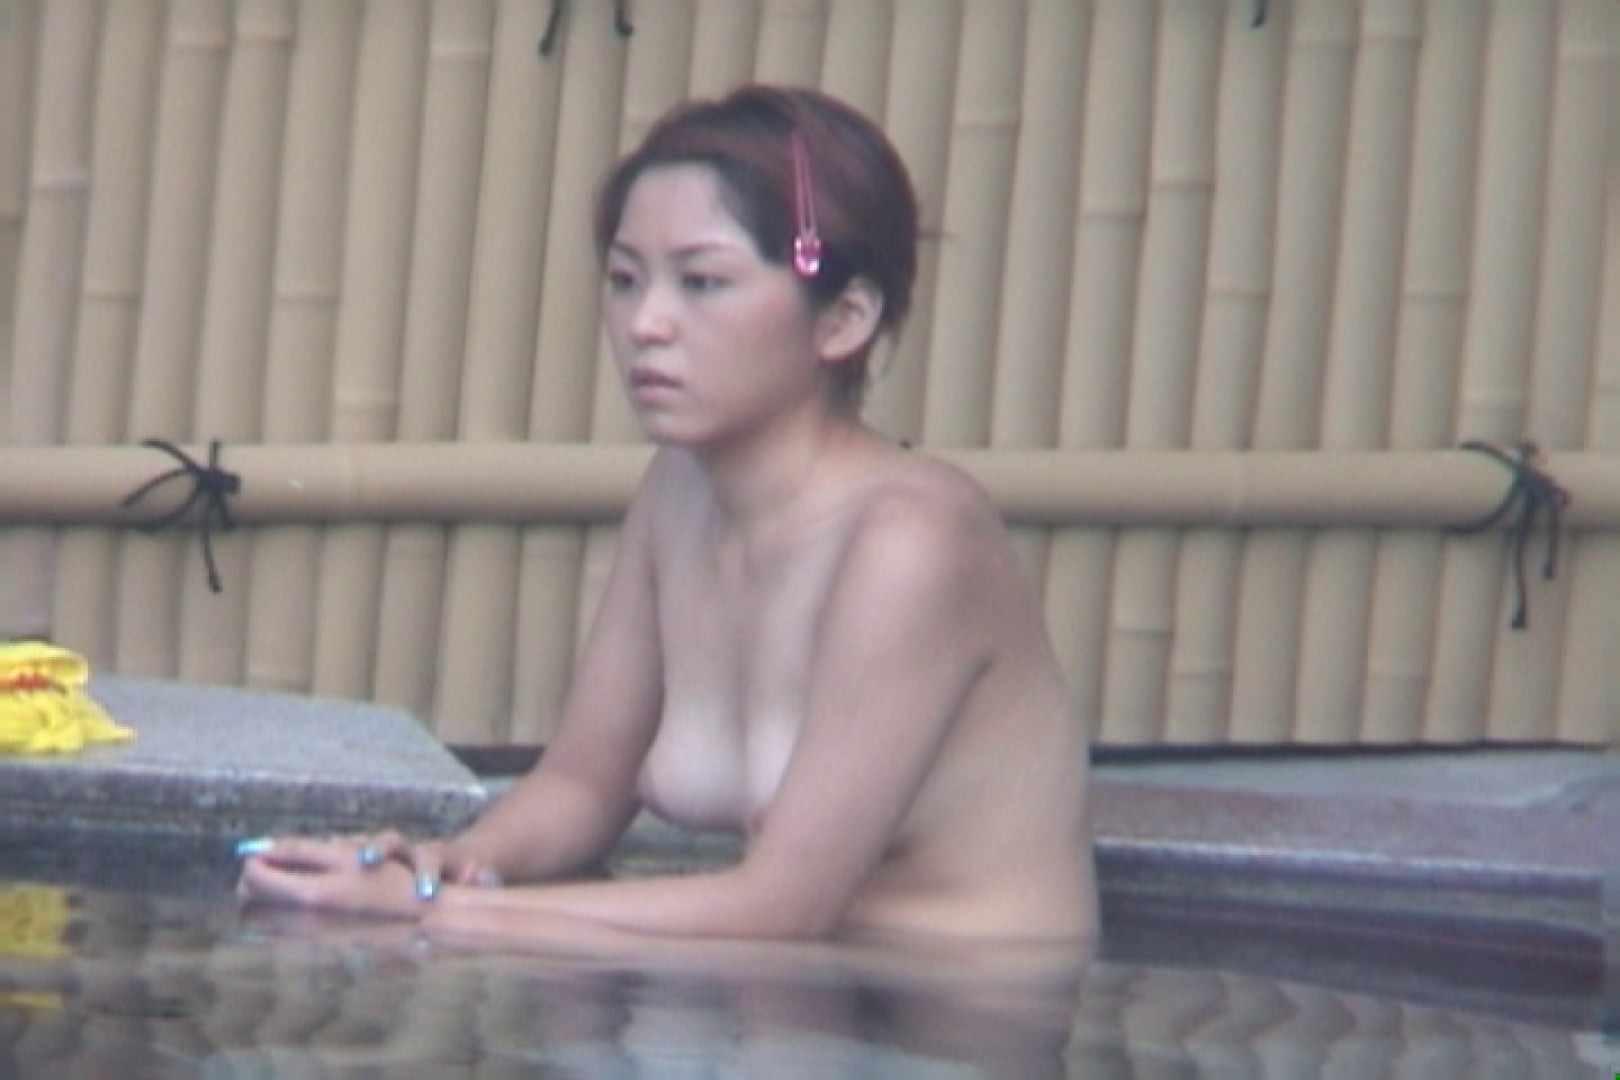 Aquaな露天風呂Vol.574 盗撮シリーズ | 露天風呂編  87PIX 57